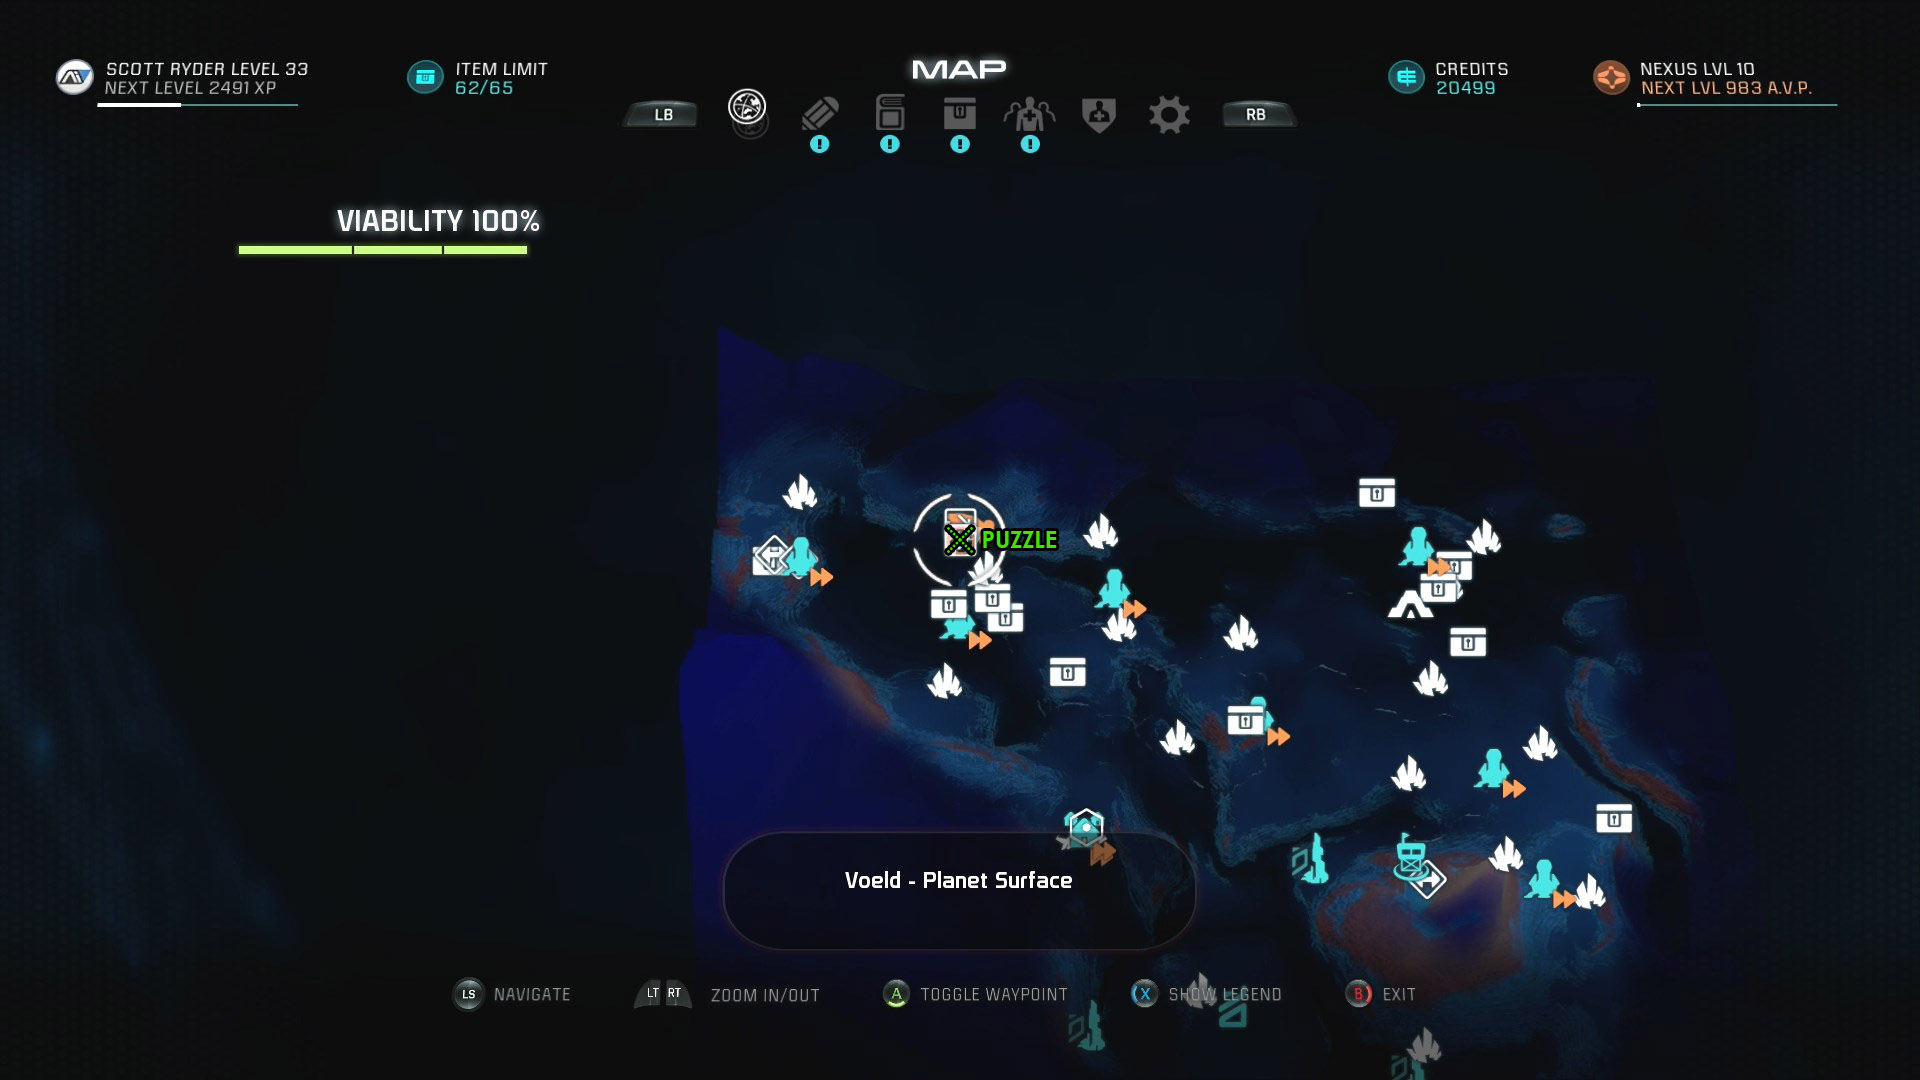 Mass Effect Andromeda Remnant Decryption Puzzle Location - Voeld - Task Subjugation